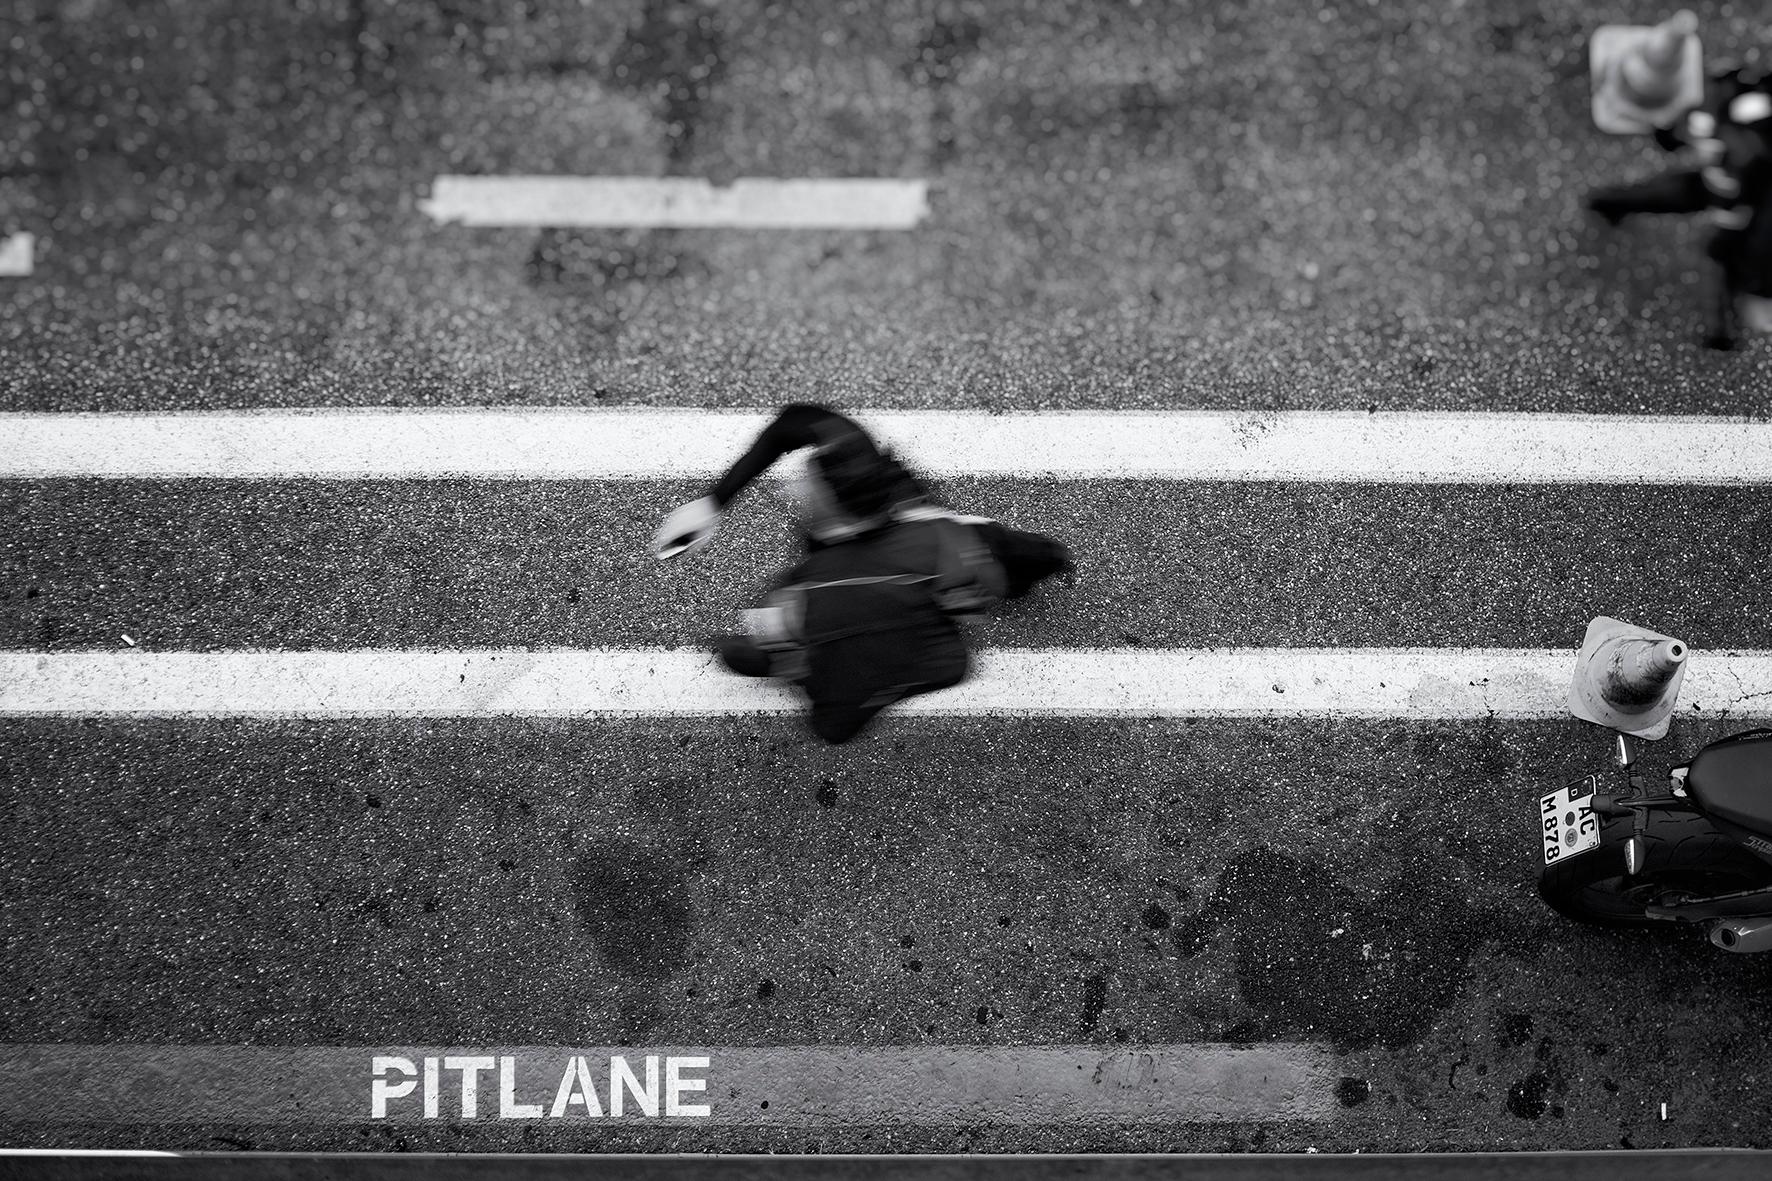 Walking Pitlane life - streetphotography - mauriliers | ello